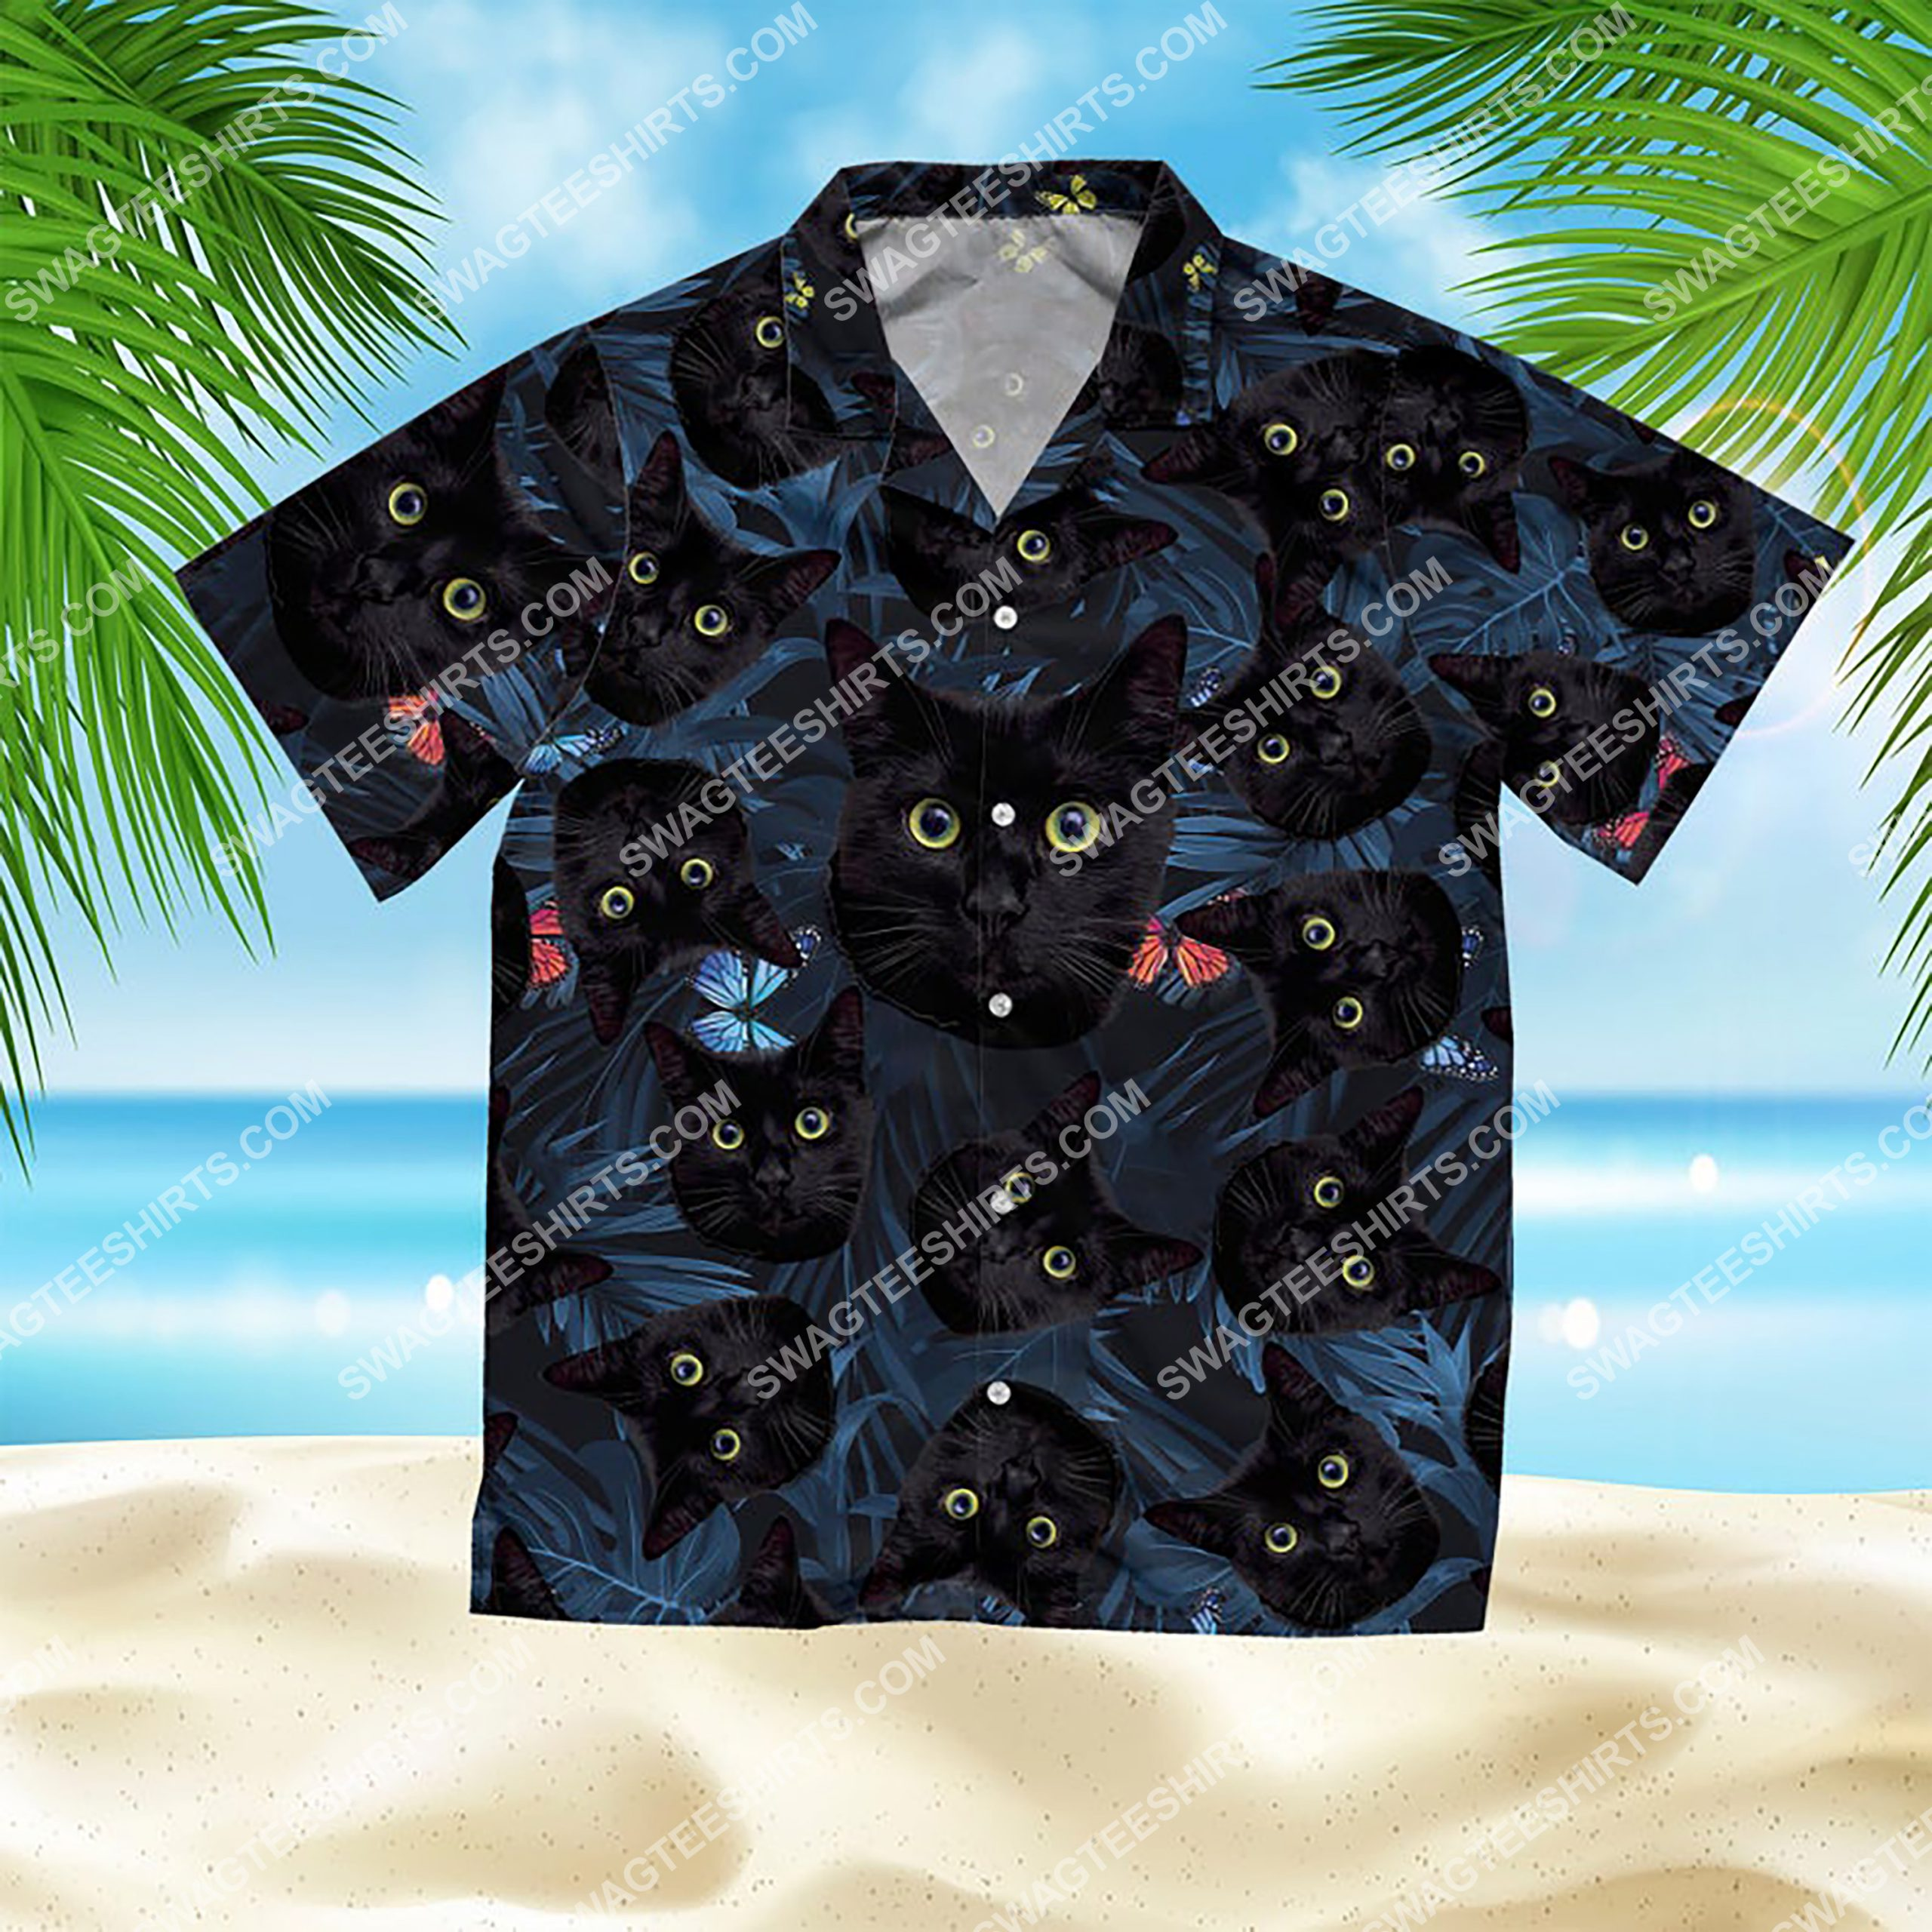 summer time tropical black cat all over print hawaiian shirt 2(1)